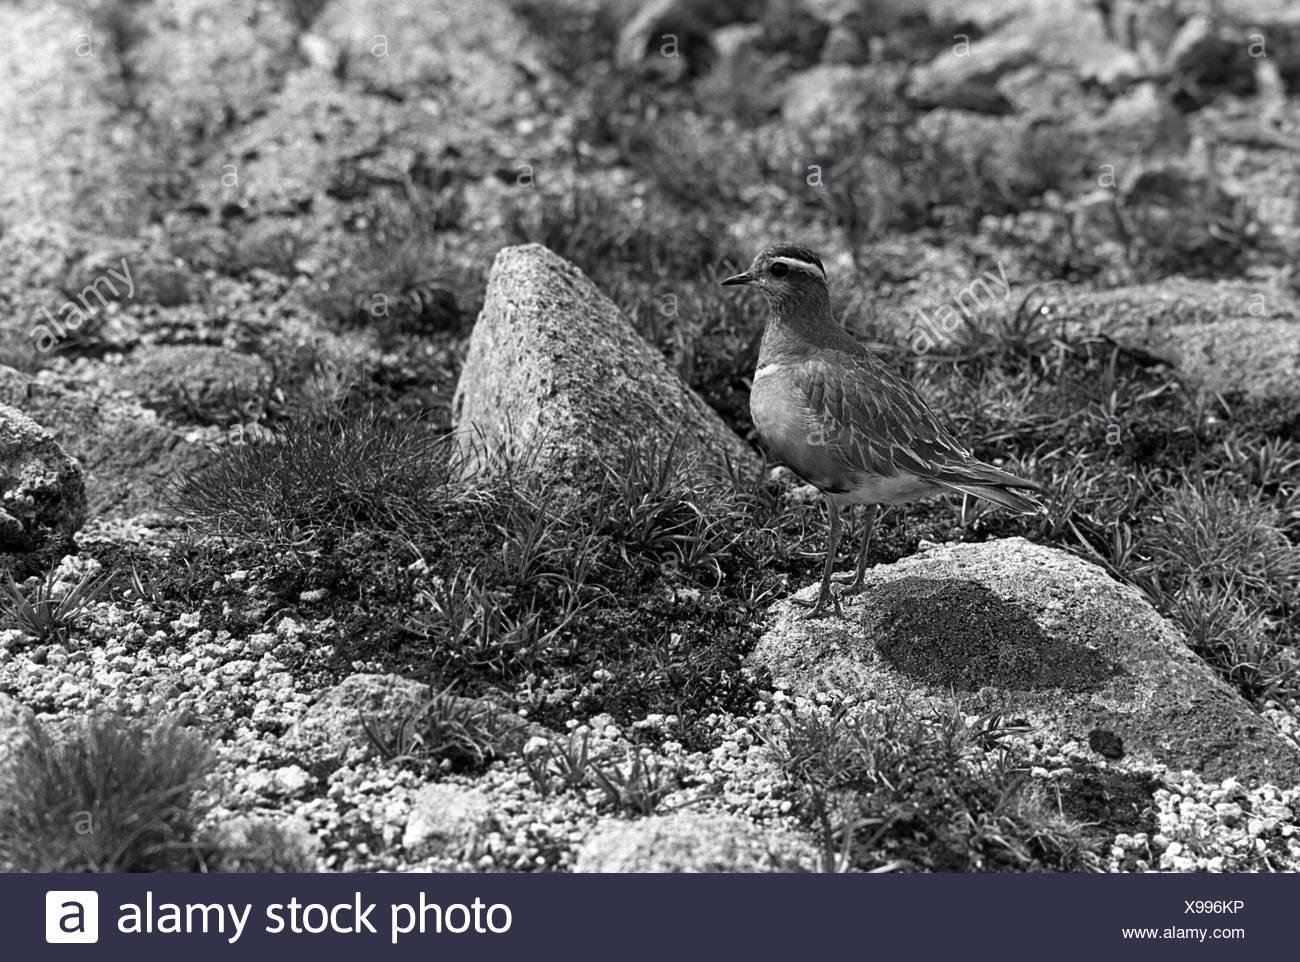 Dotterel - Braeriach Scotland. Taken in 1940 by Eric Hosking. - Stock Image